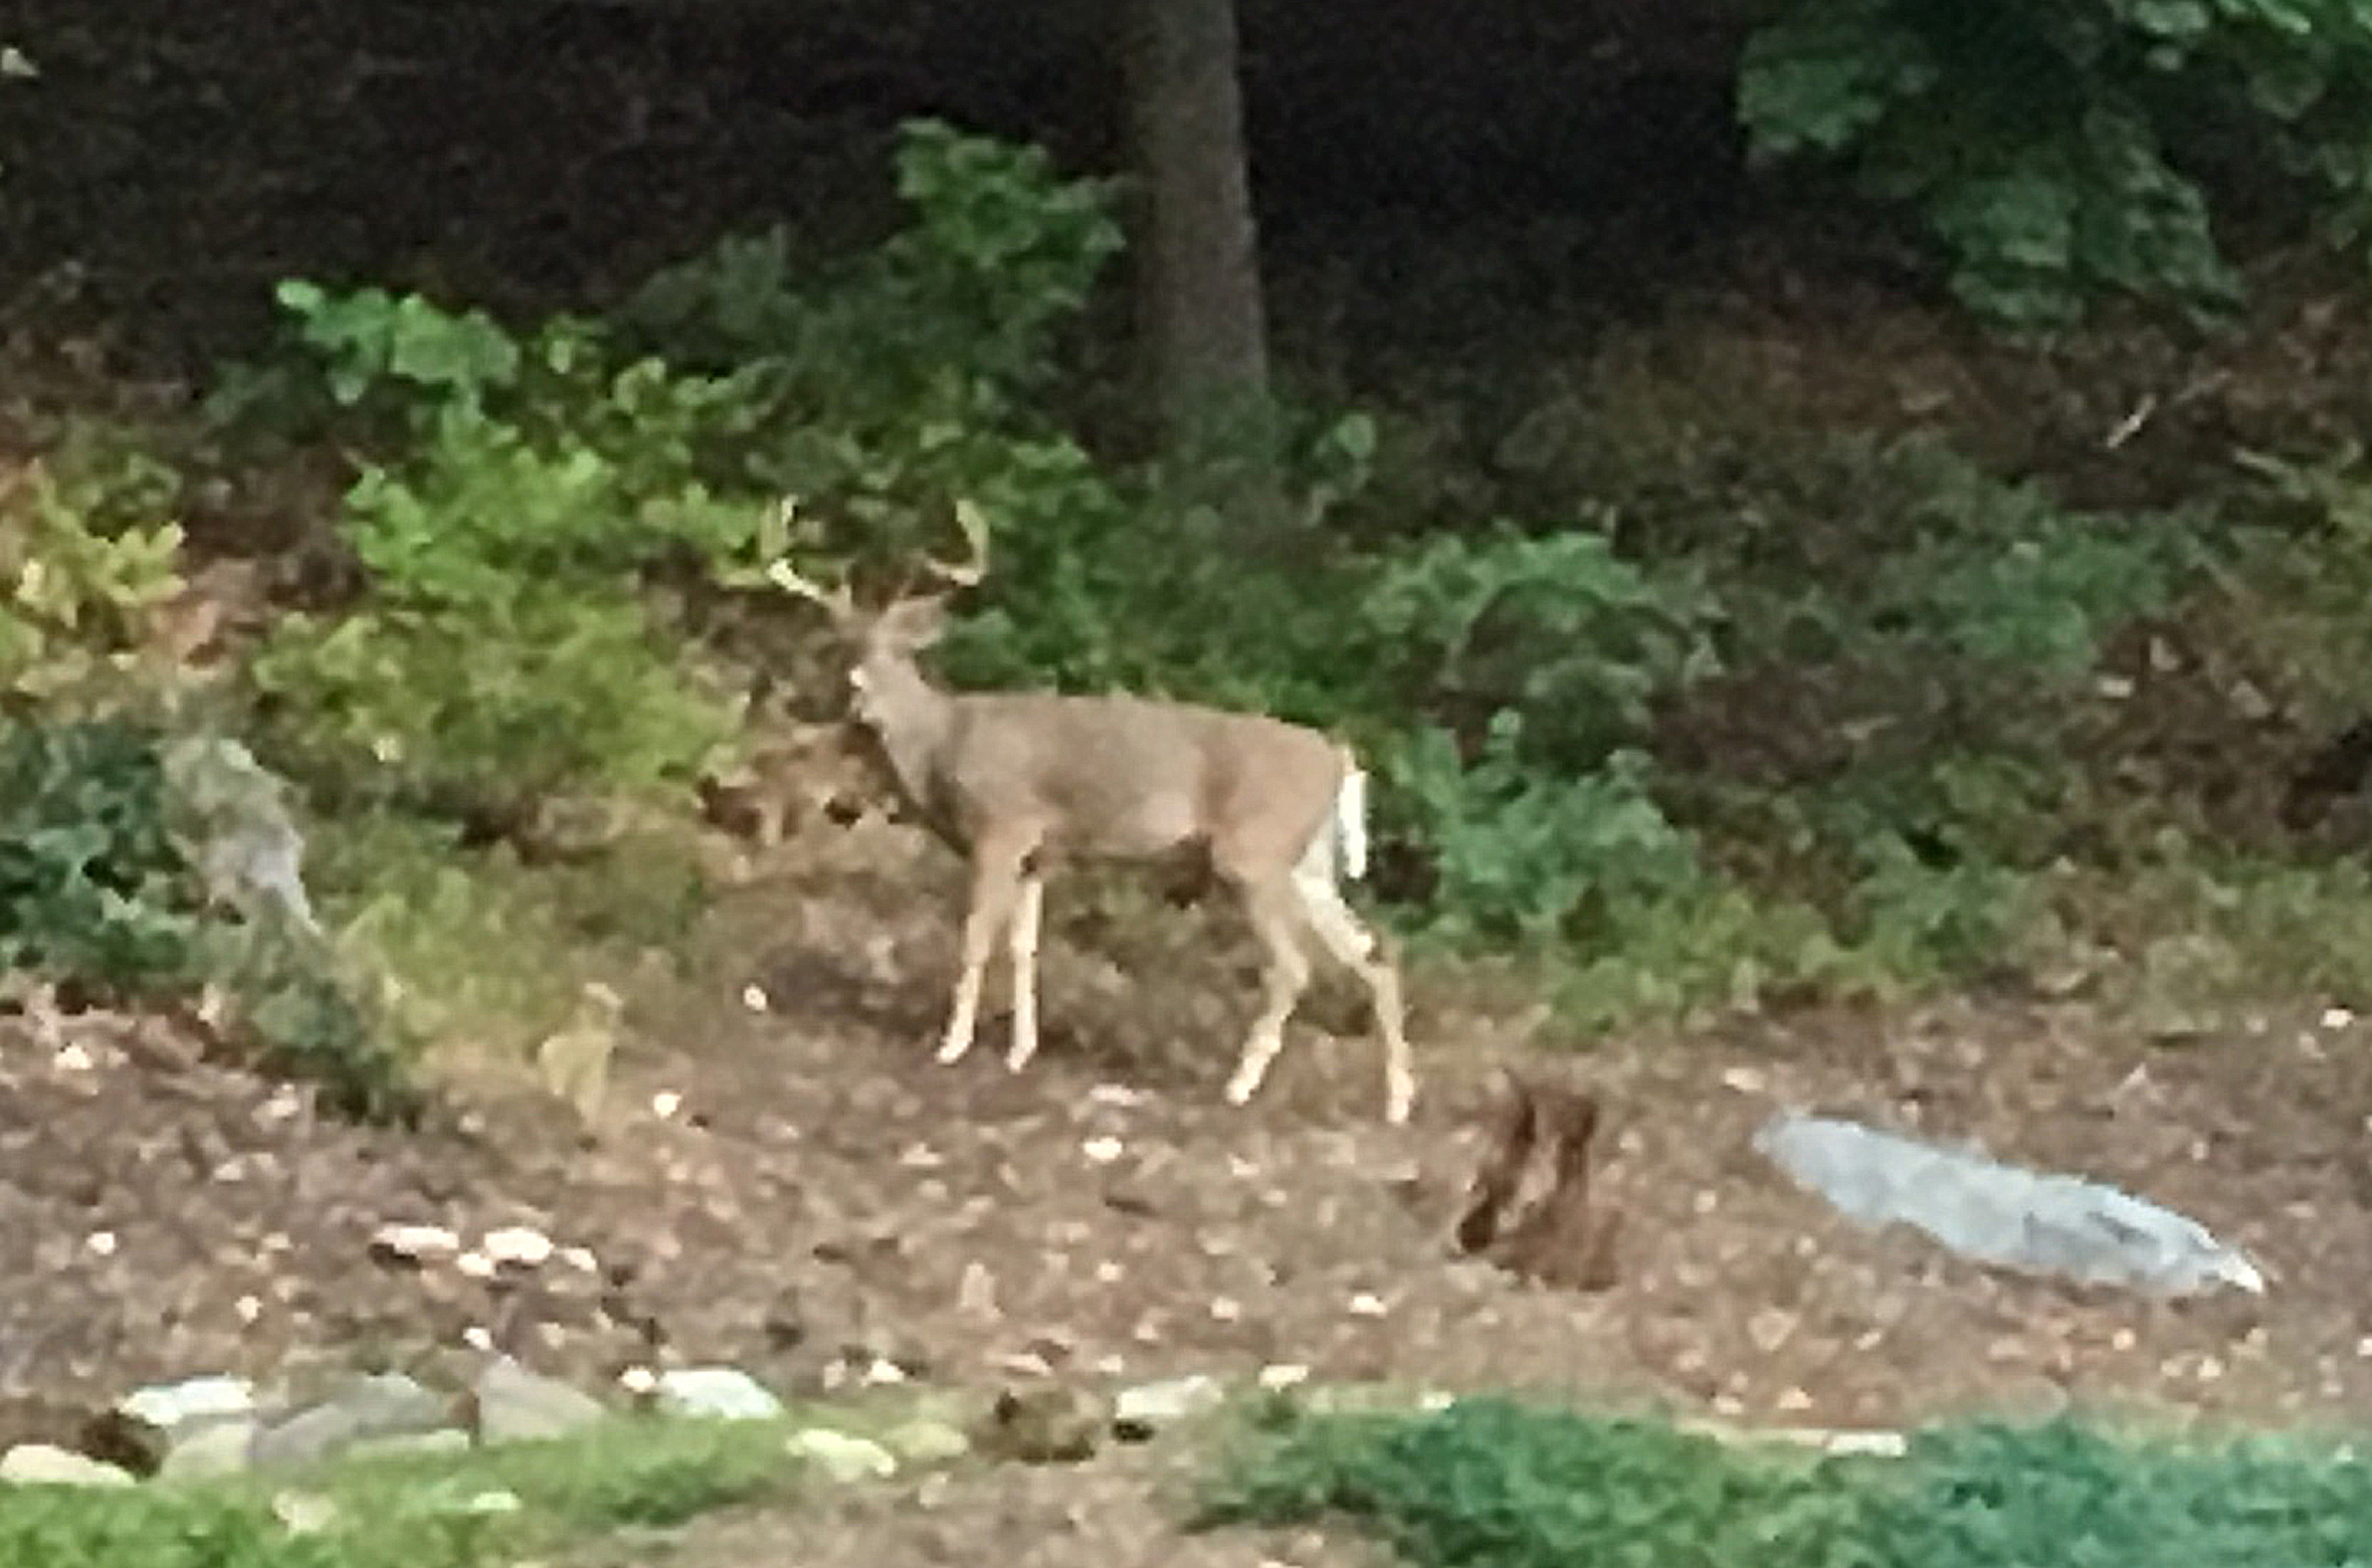 right in my backyard deer hunting hunting new york ny